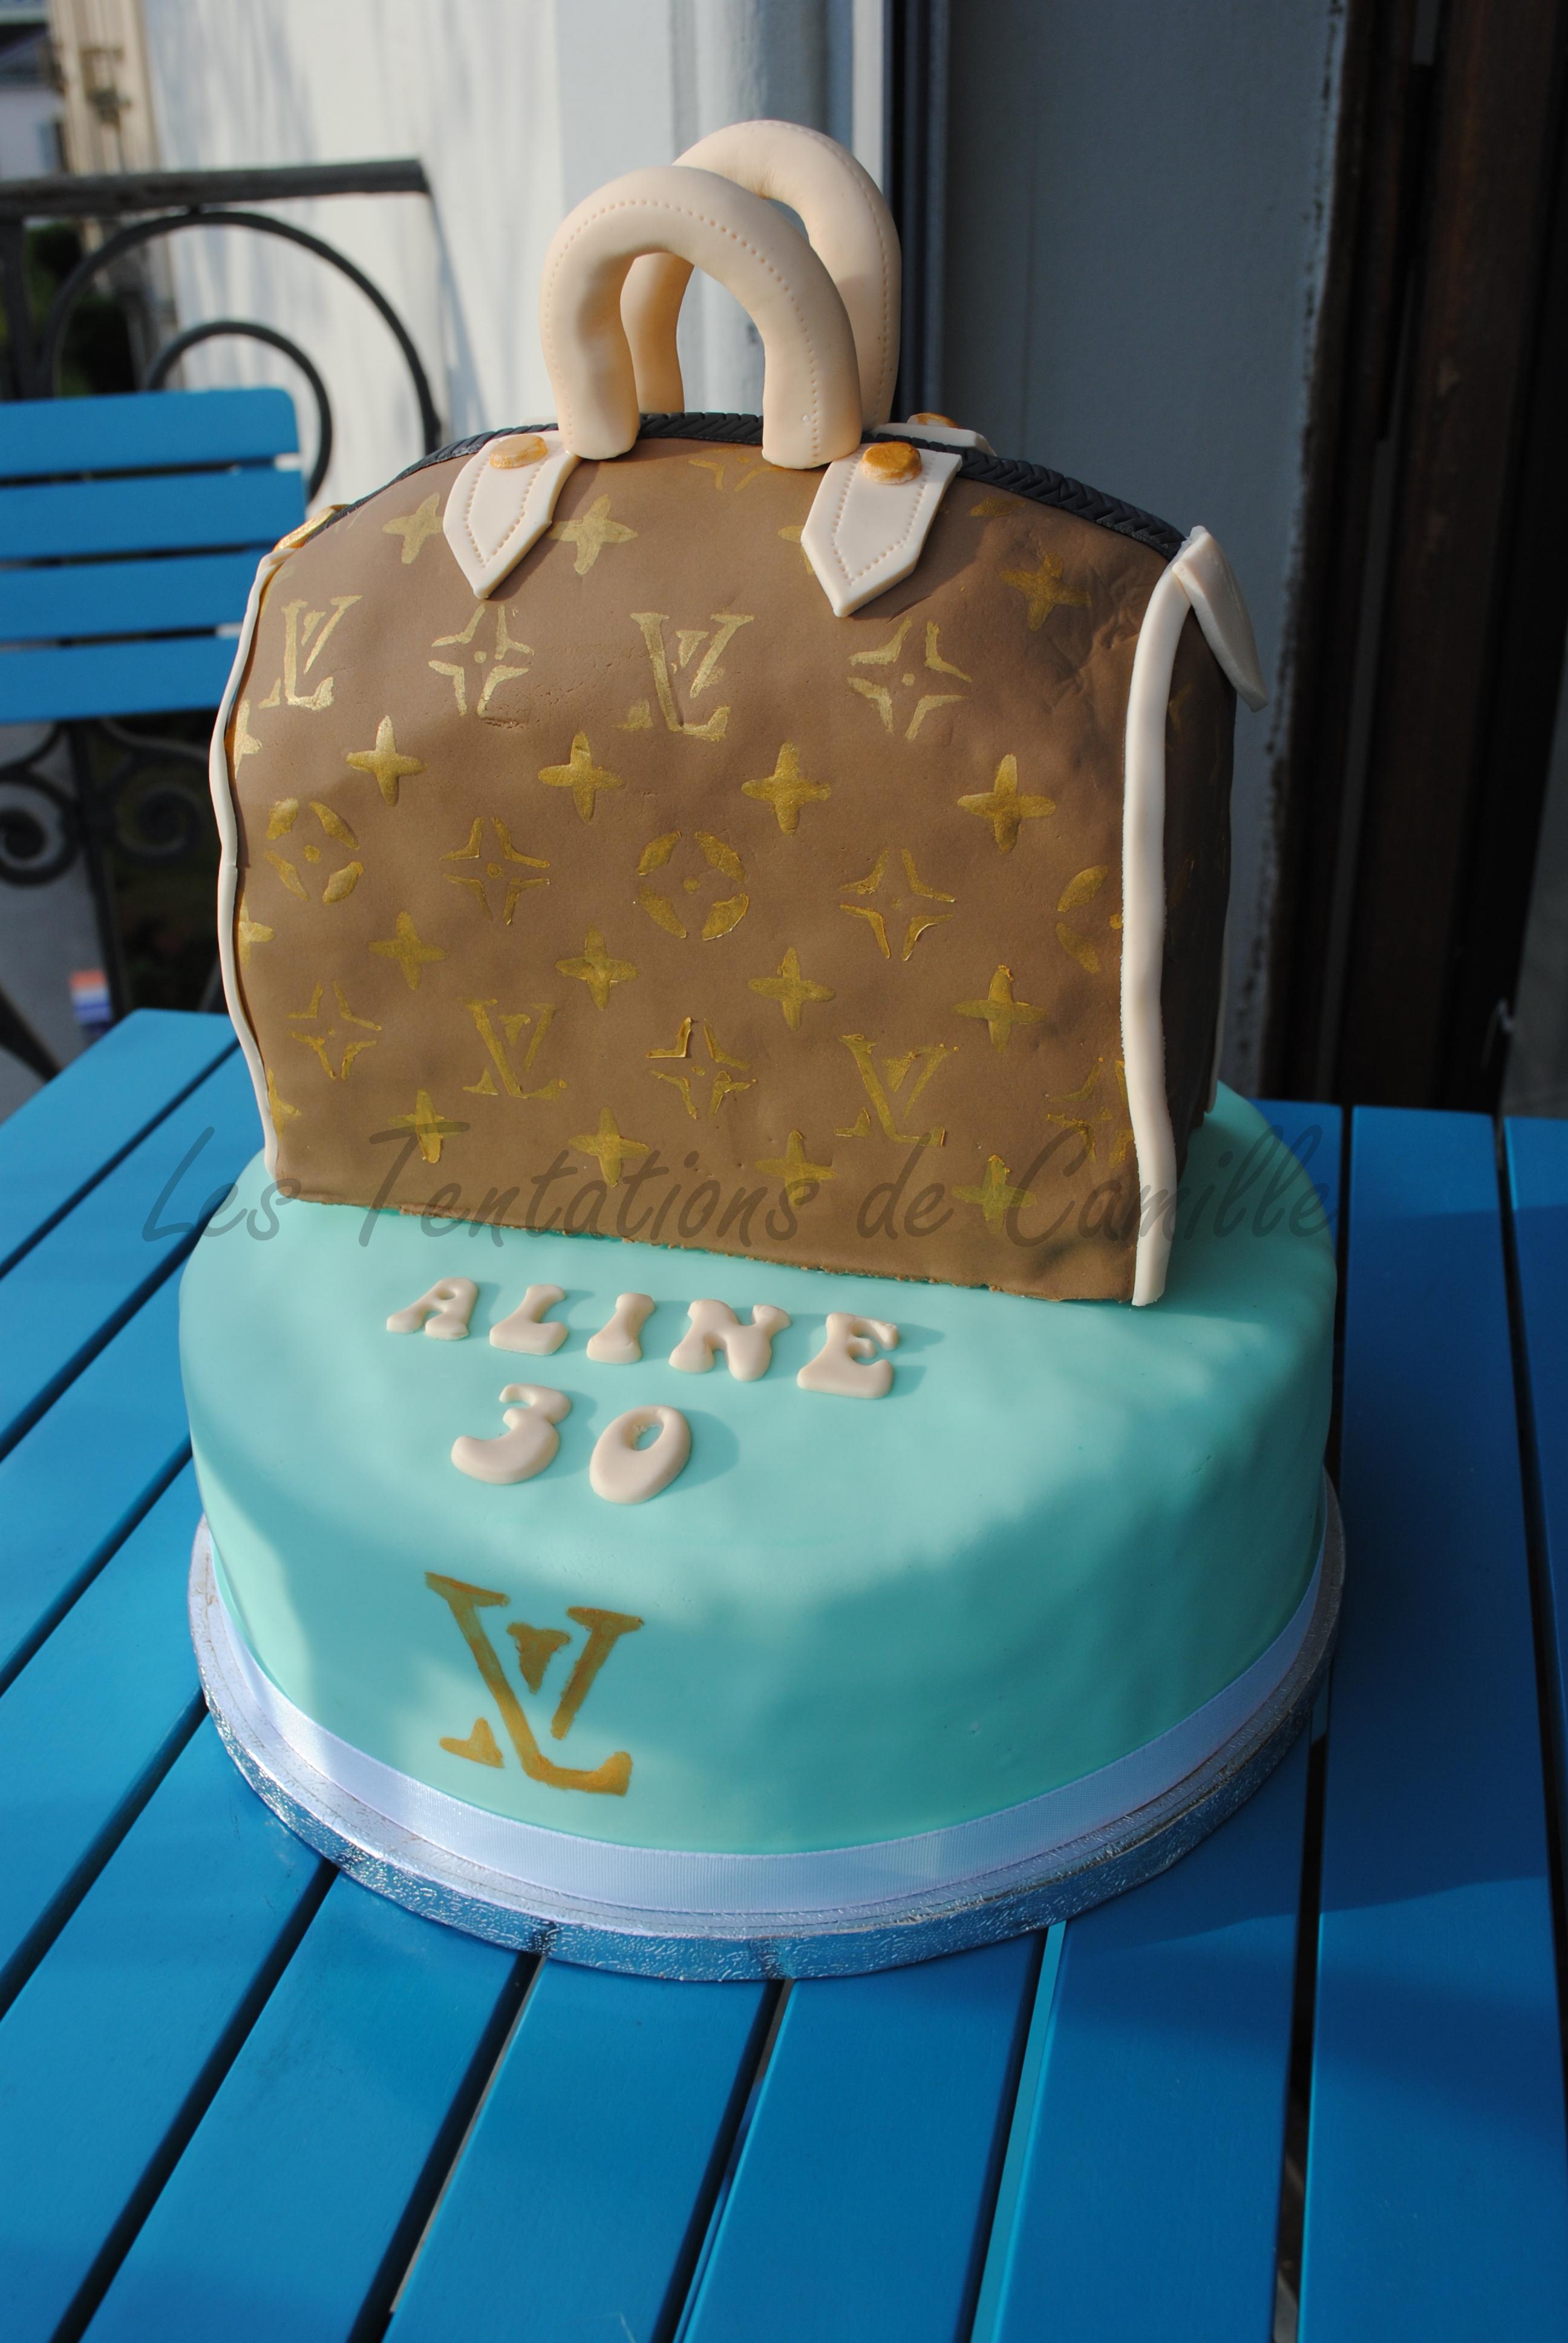 Louis Vuitton Bag Cake   CakeCentral.com